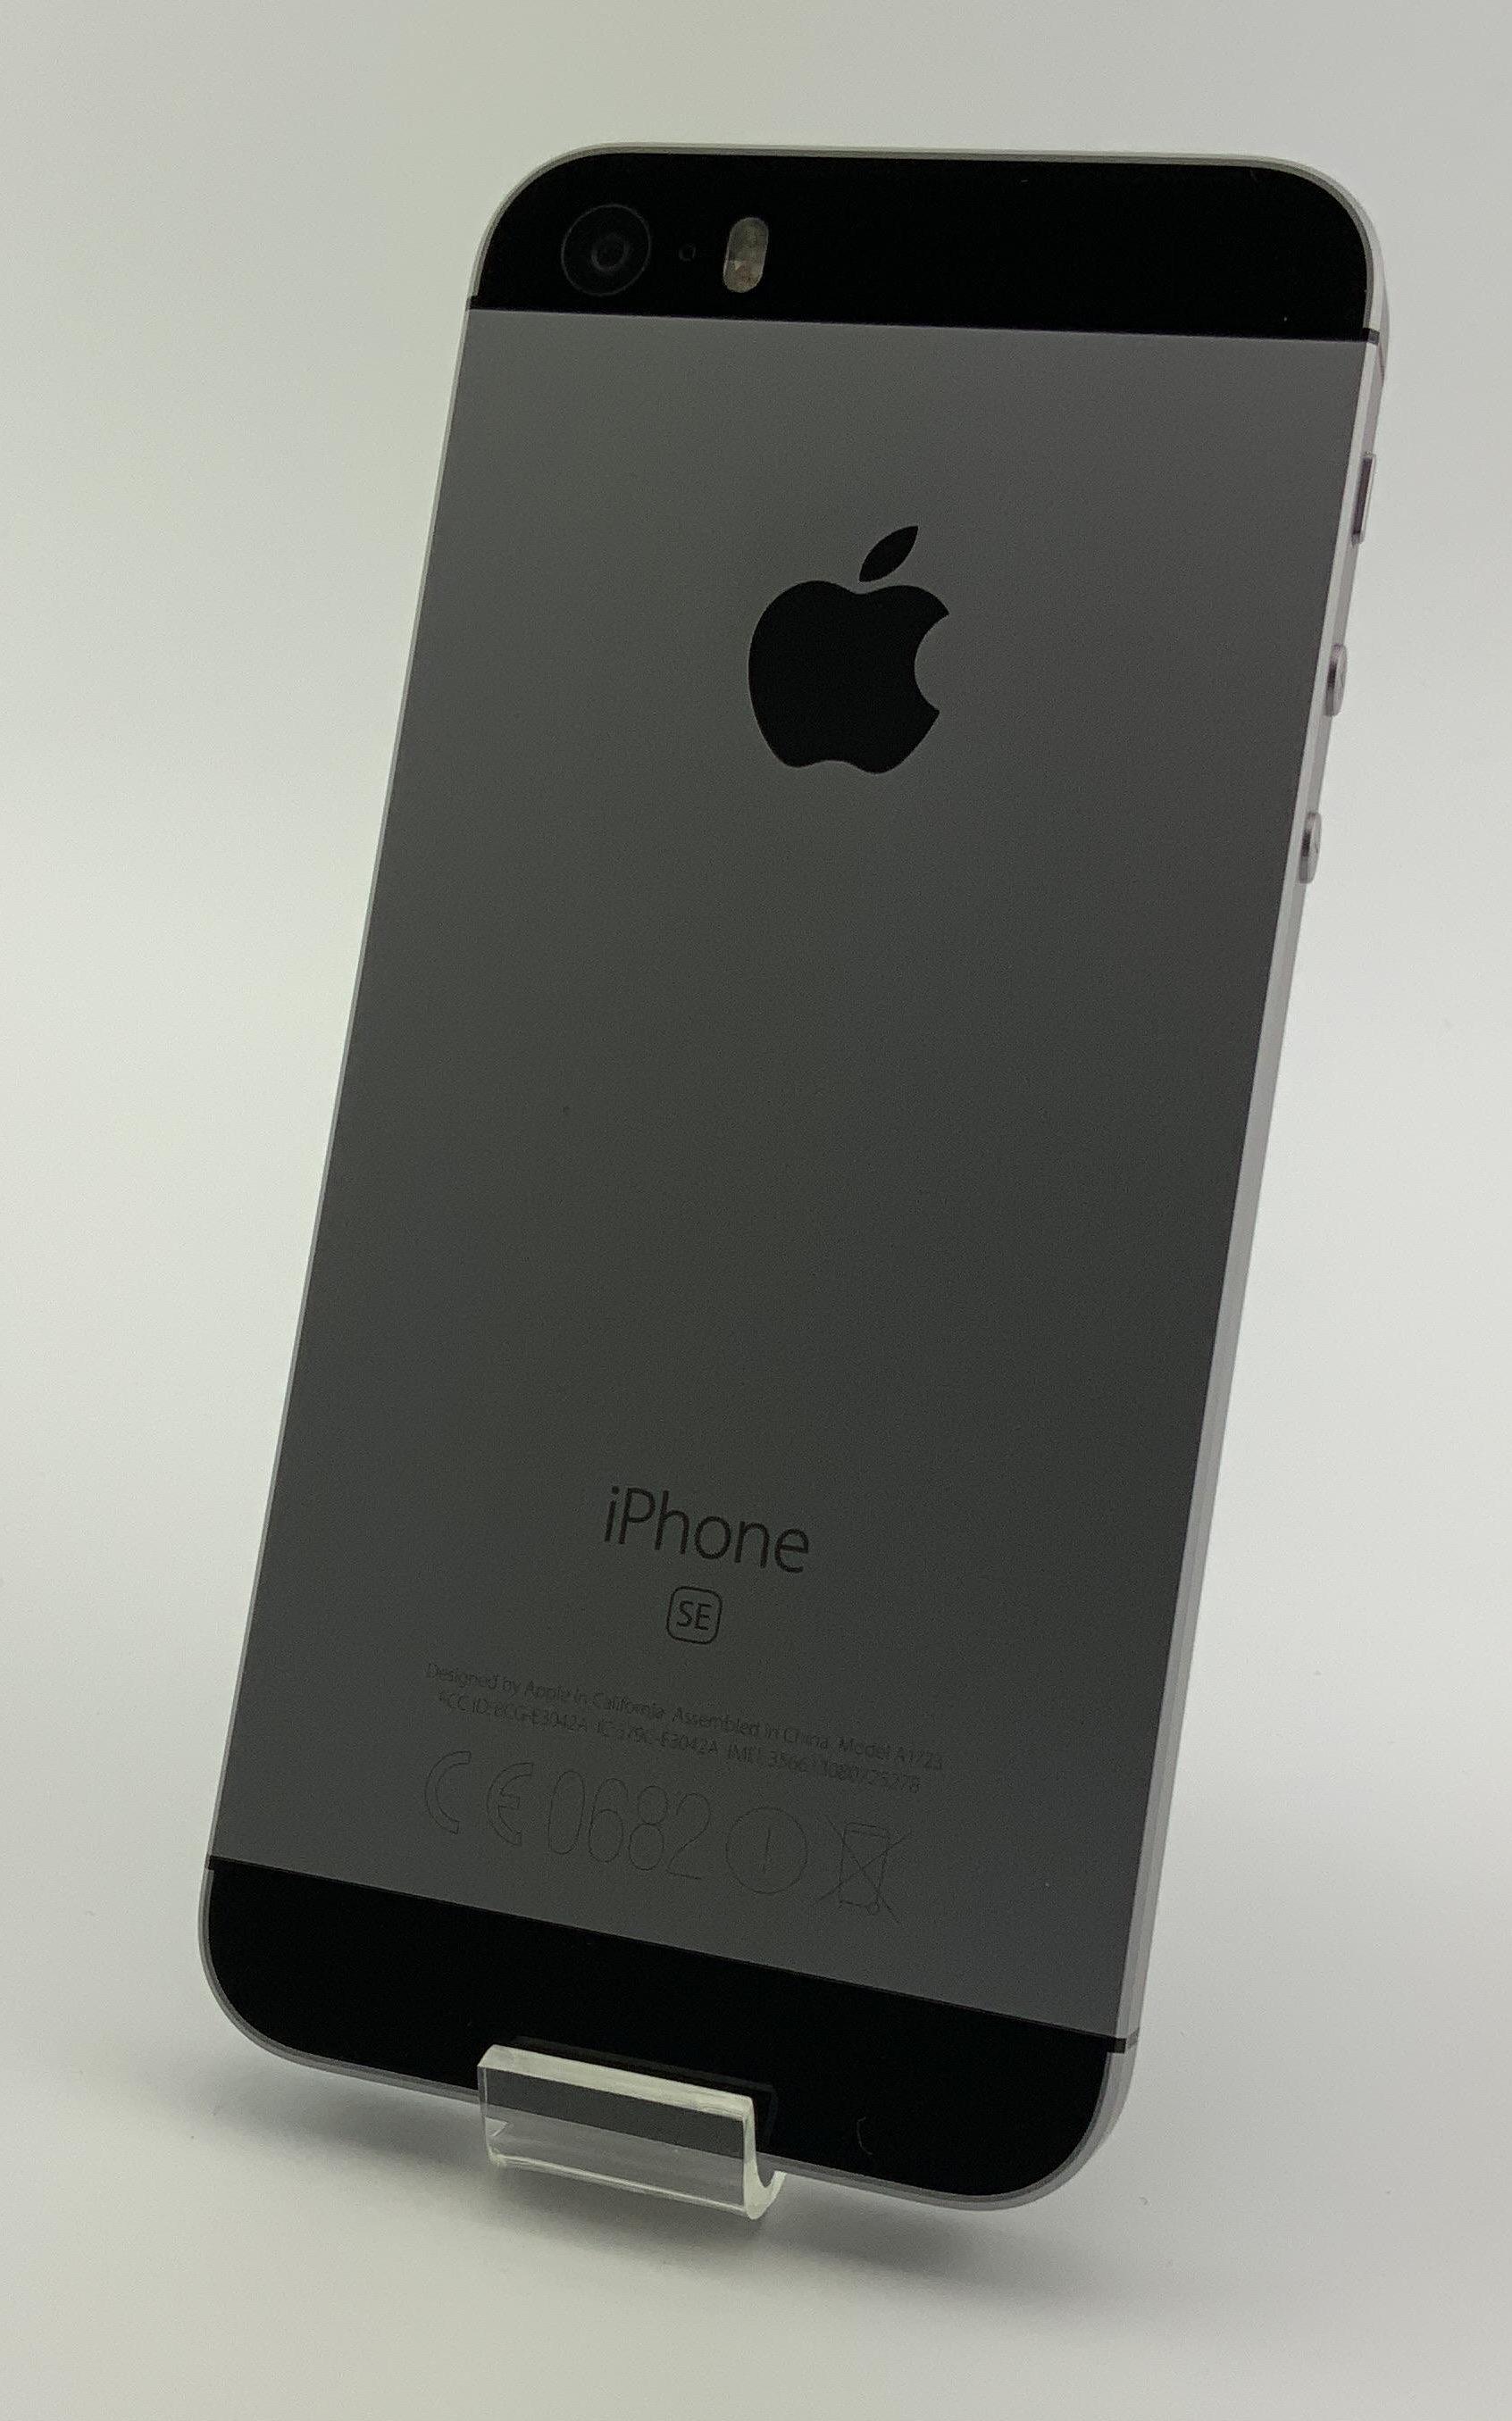 iPhone SE 16GB, 16GB, Space Gray, image 2